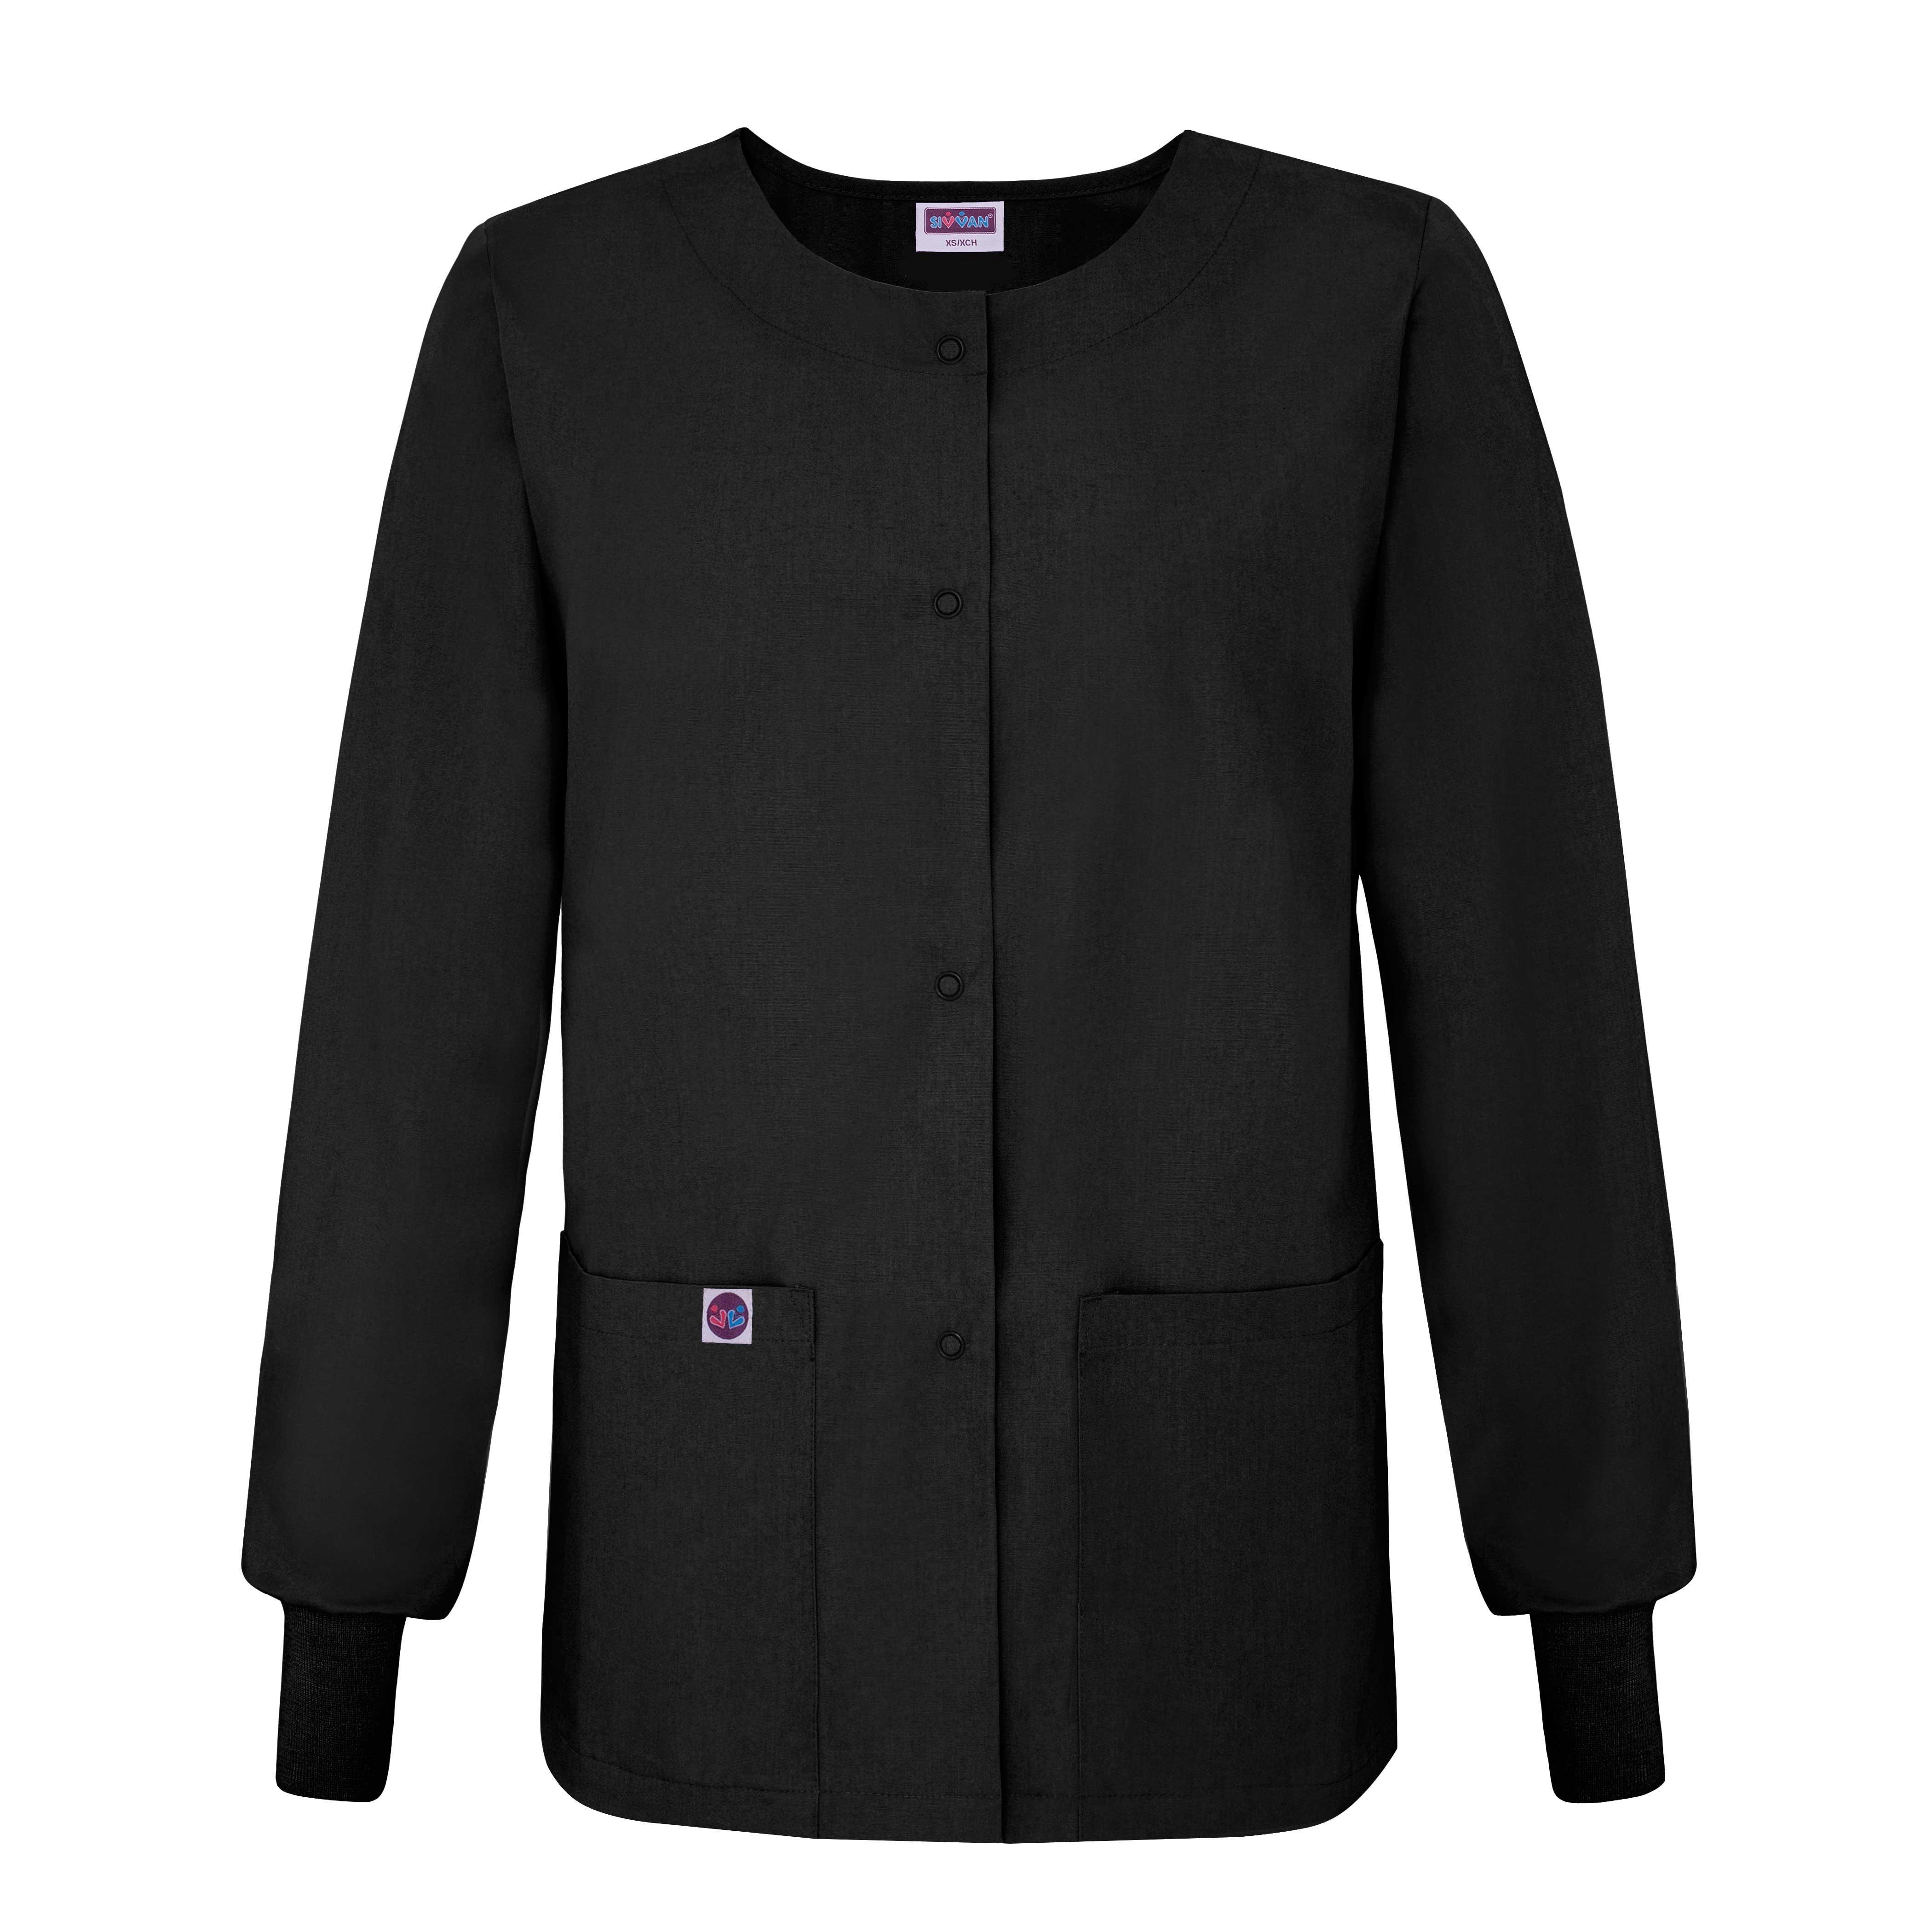 S8306 S Sivvan Womens Scrubs Warm-Up Jacket//Front Snaps Khaki Round Neck